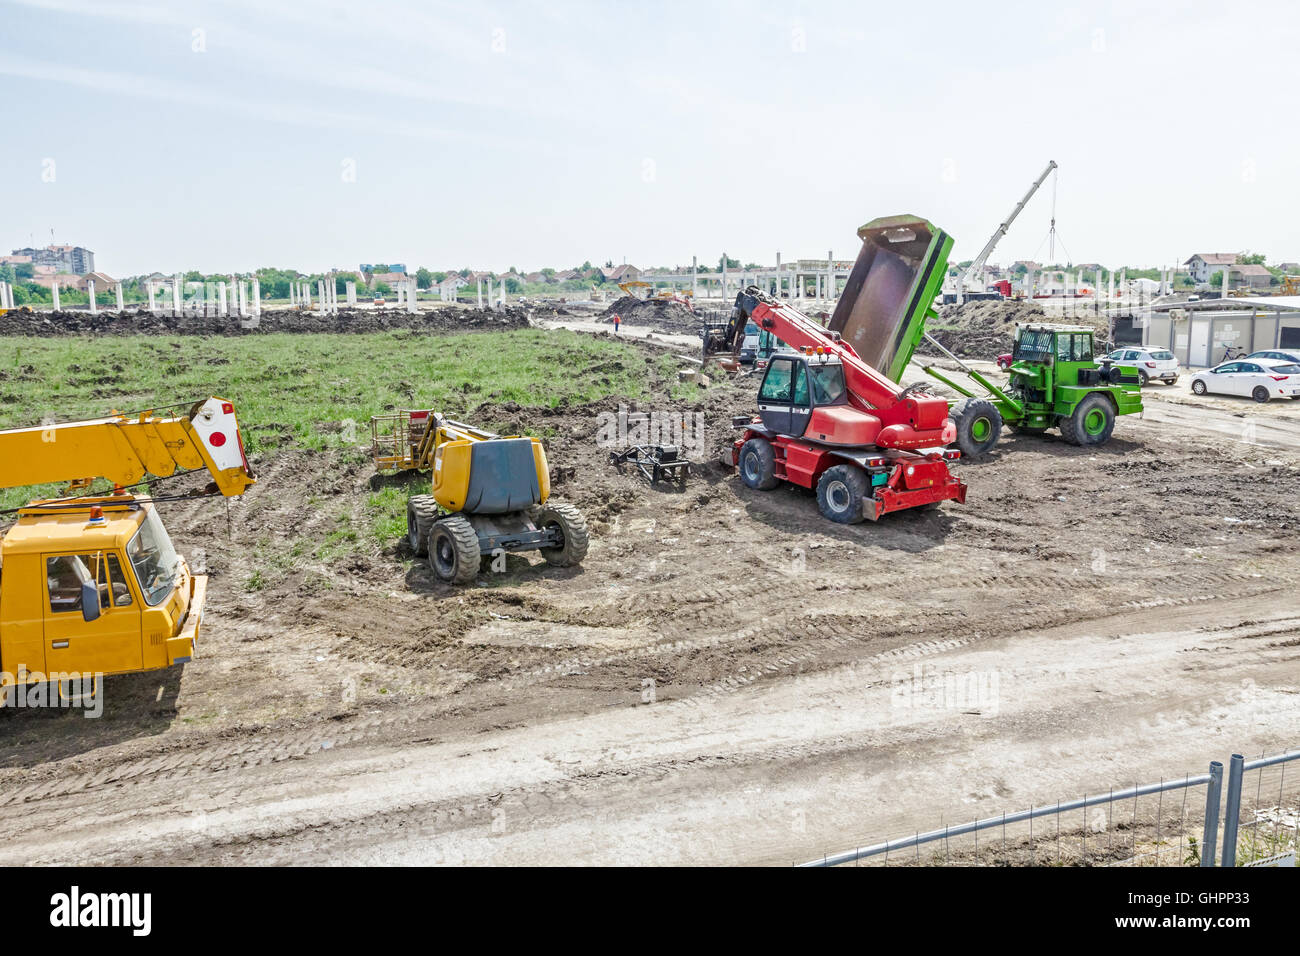 Crane, cherry picker, telescopic forklift and dumper truck